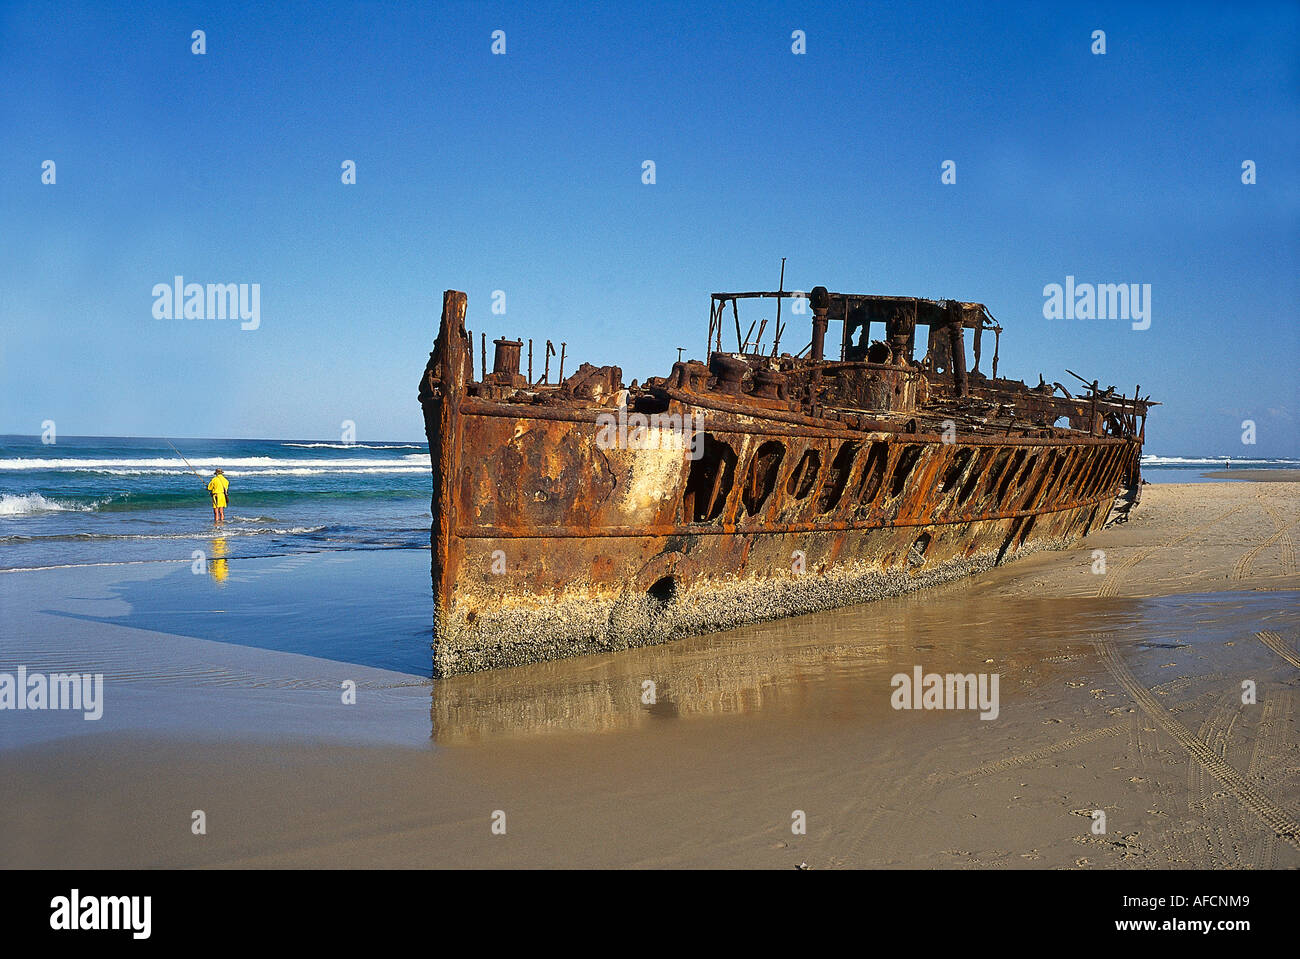 Maheno Shipwreck, Fraser Island Queensland, Australia - Stock Image